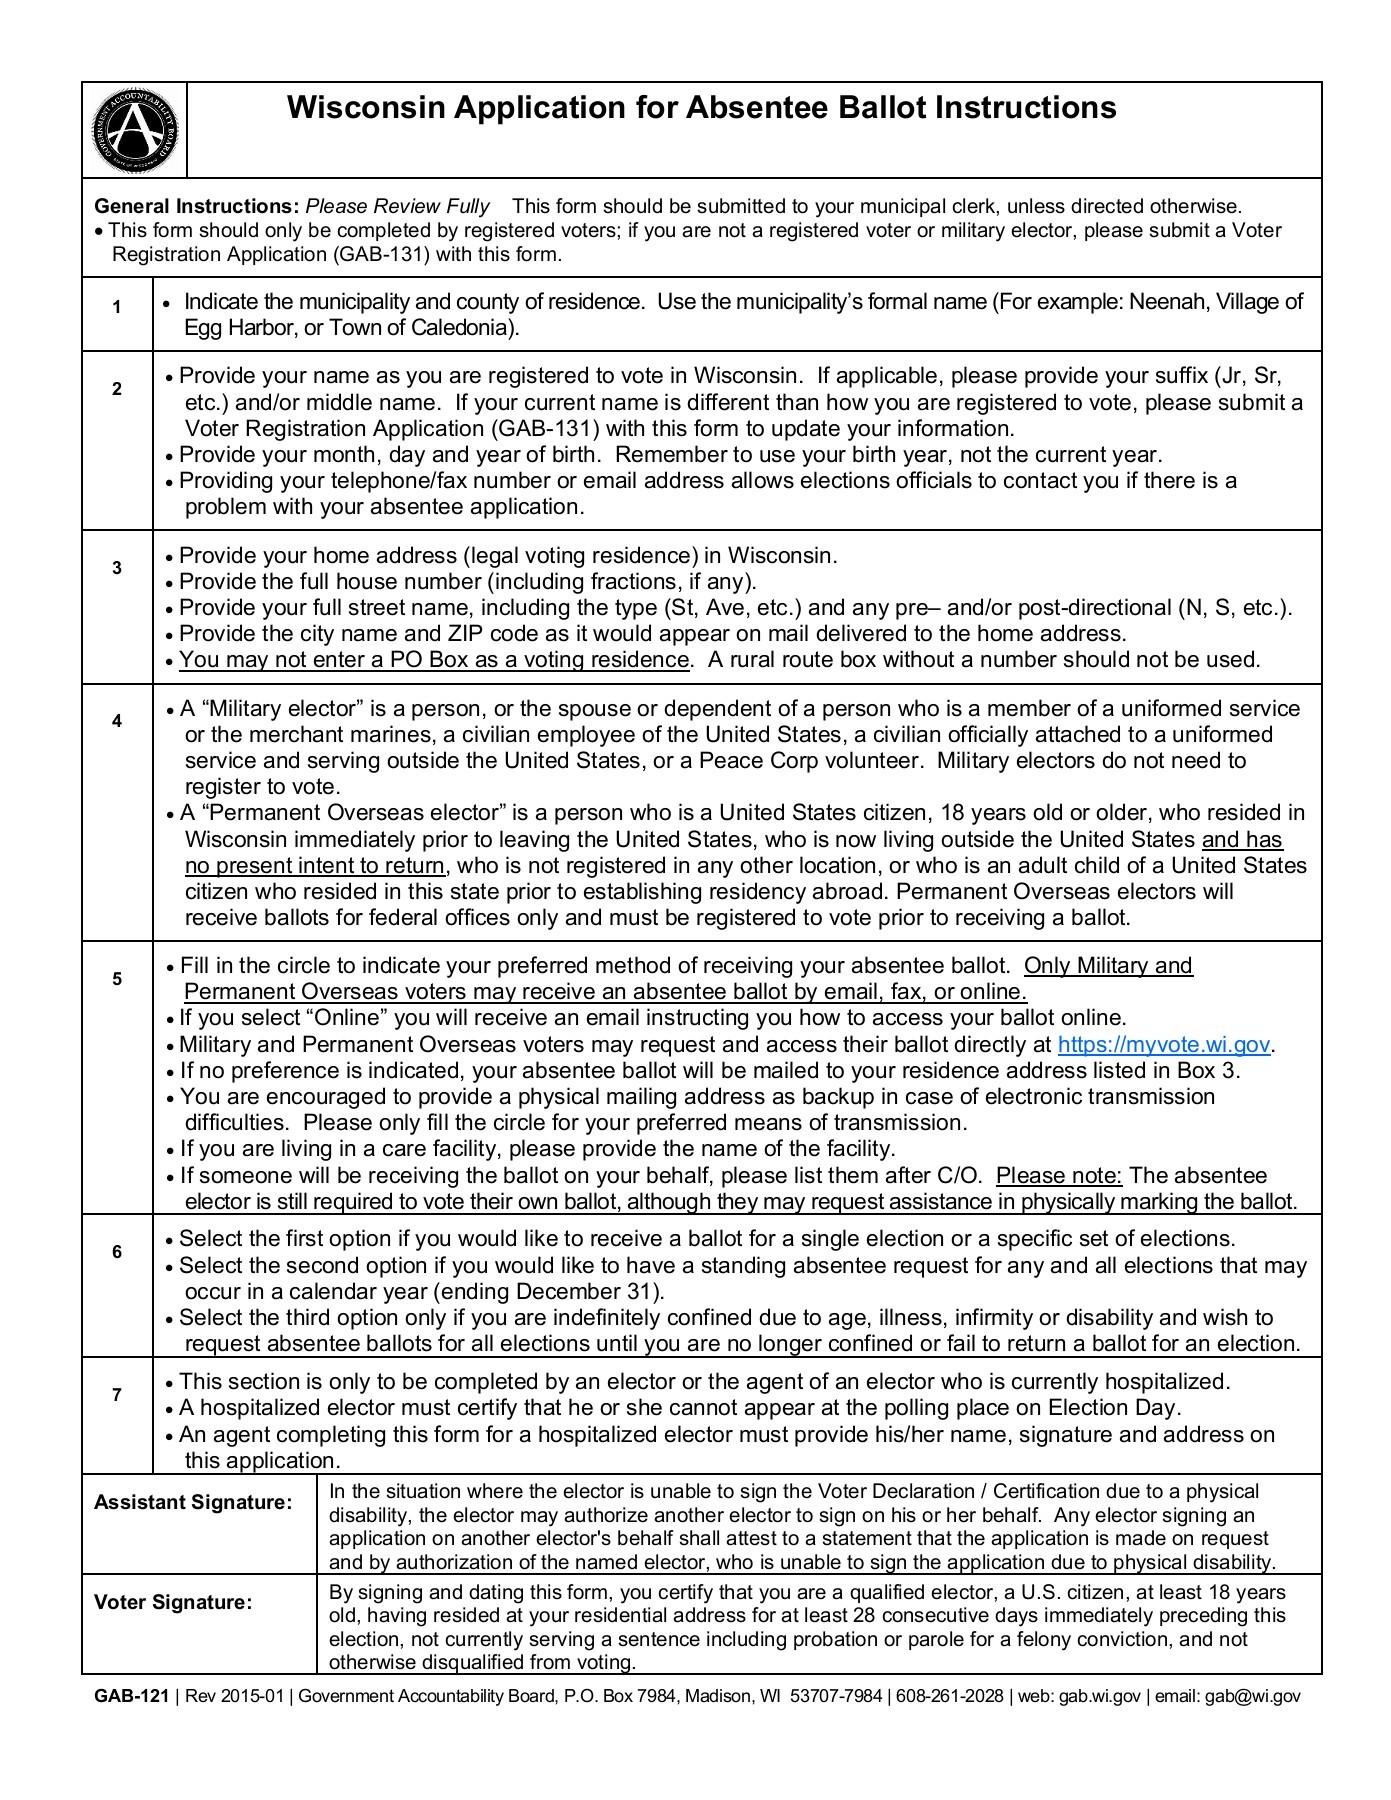 wisconsin application for absentee ballot gab 121